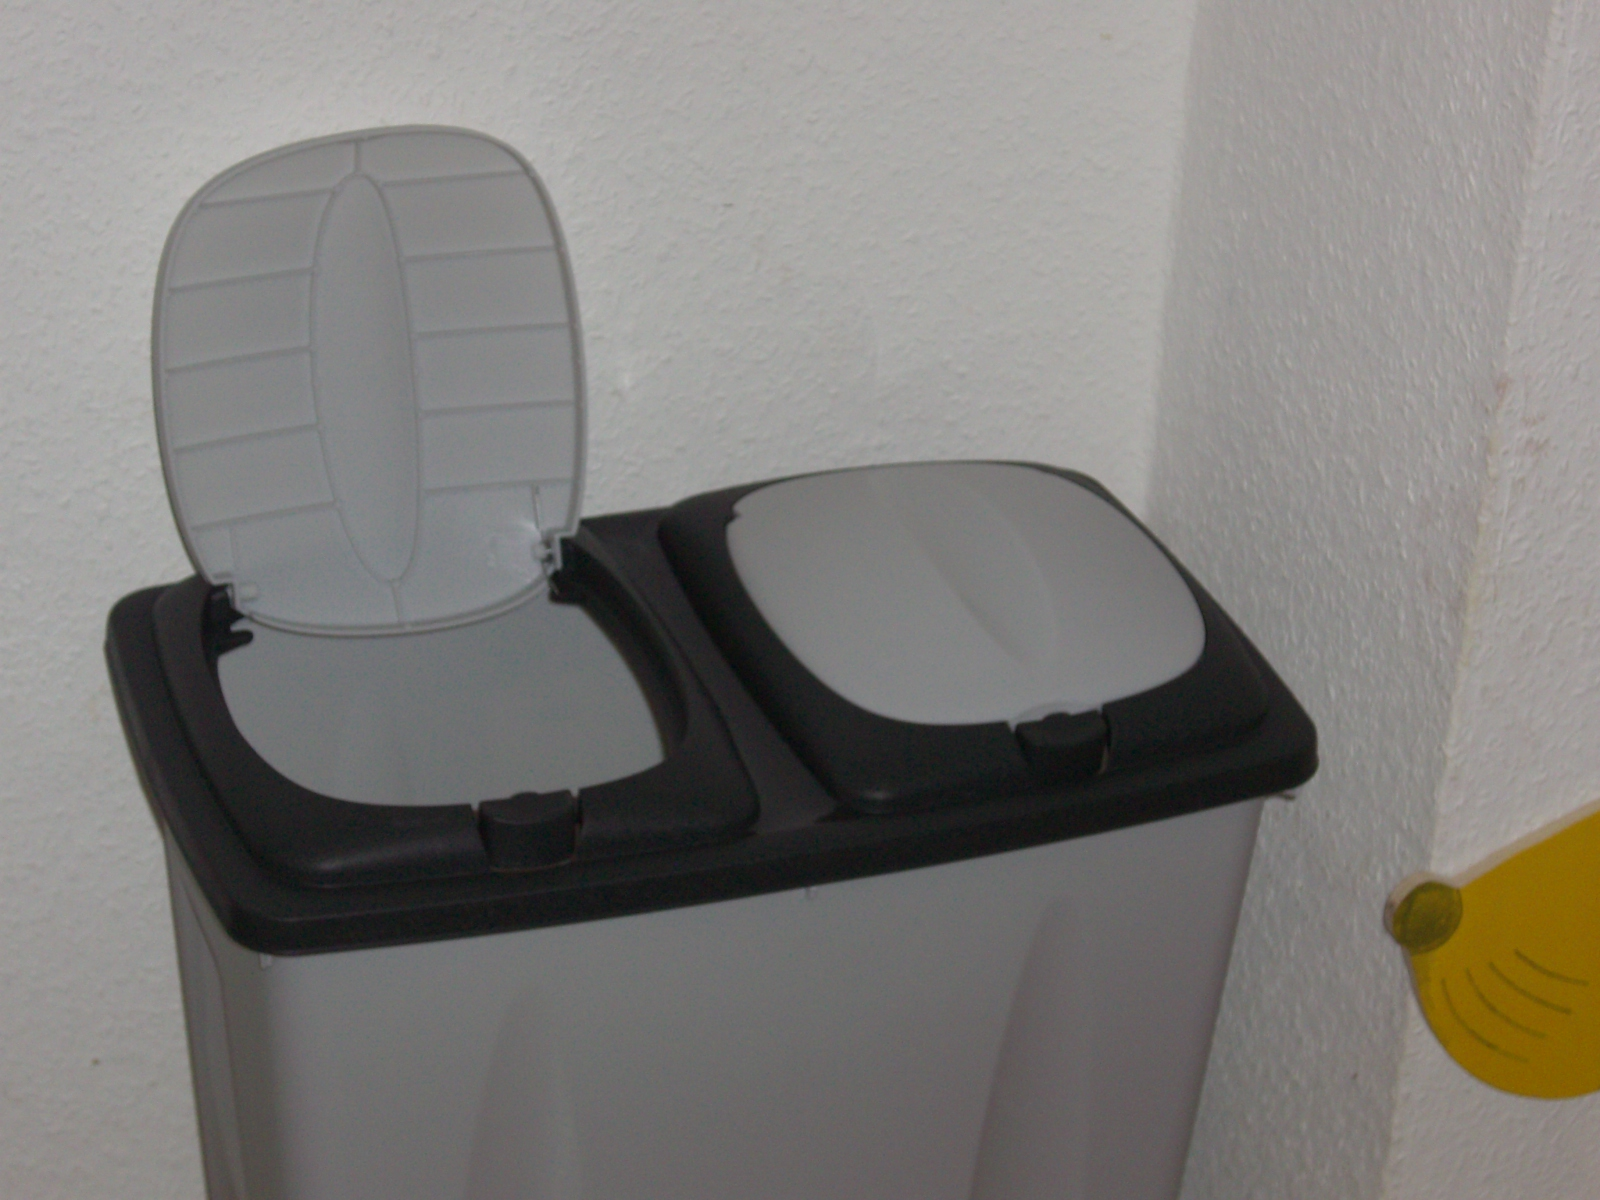 duobin 2x25 liter abfalleimer m lleimer abfallsammler push trash eimer duo bin ebay. Black Bedroom Furniture Sets. Home Design Ideas